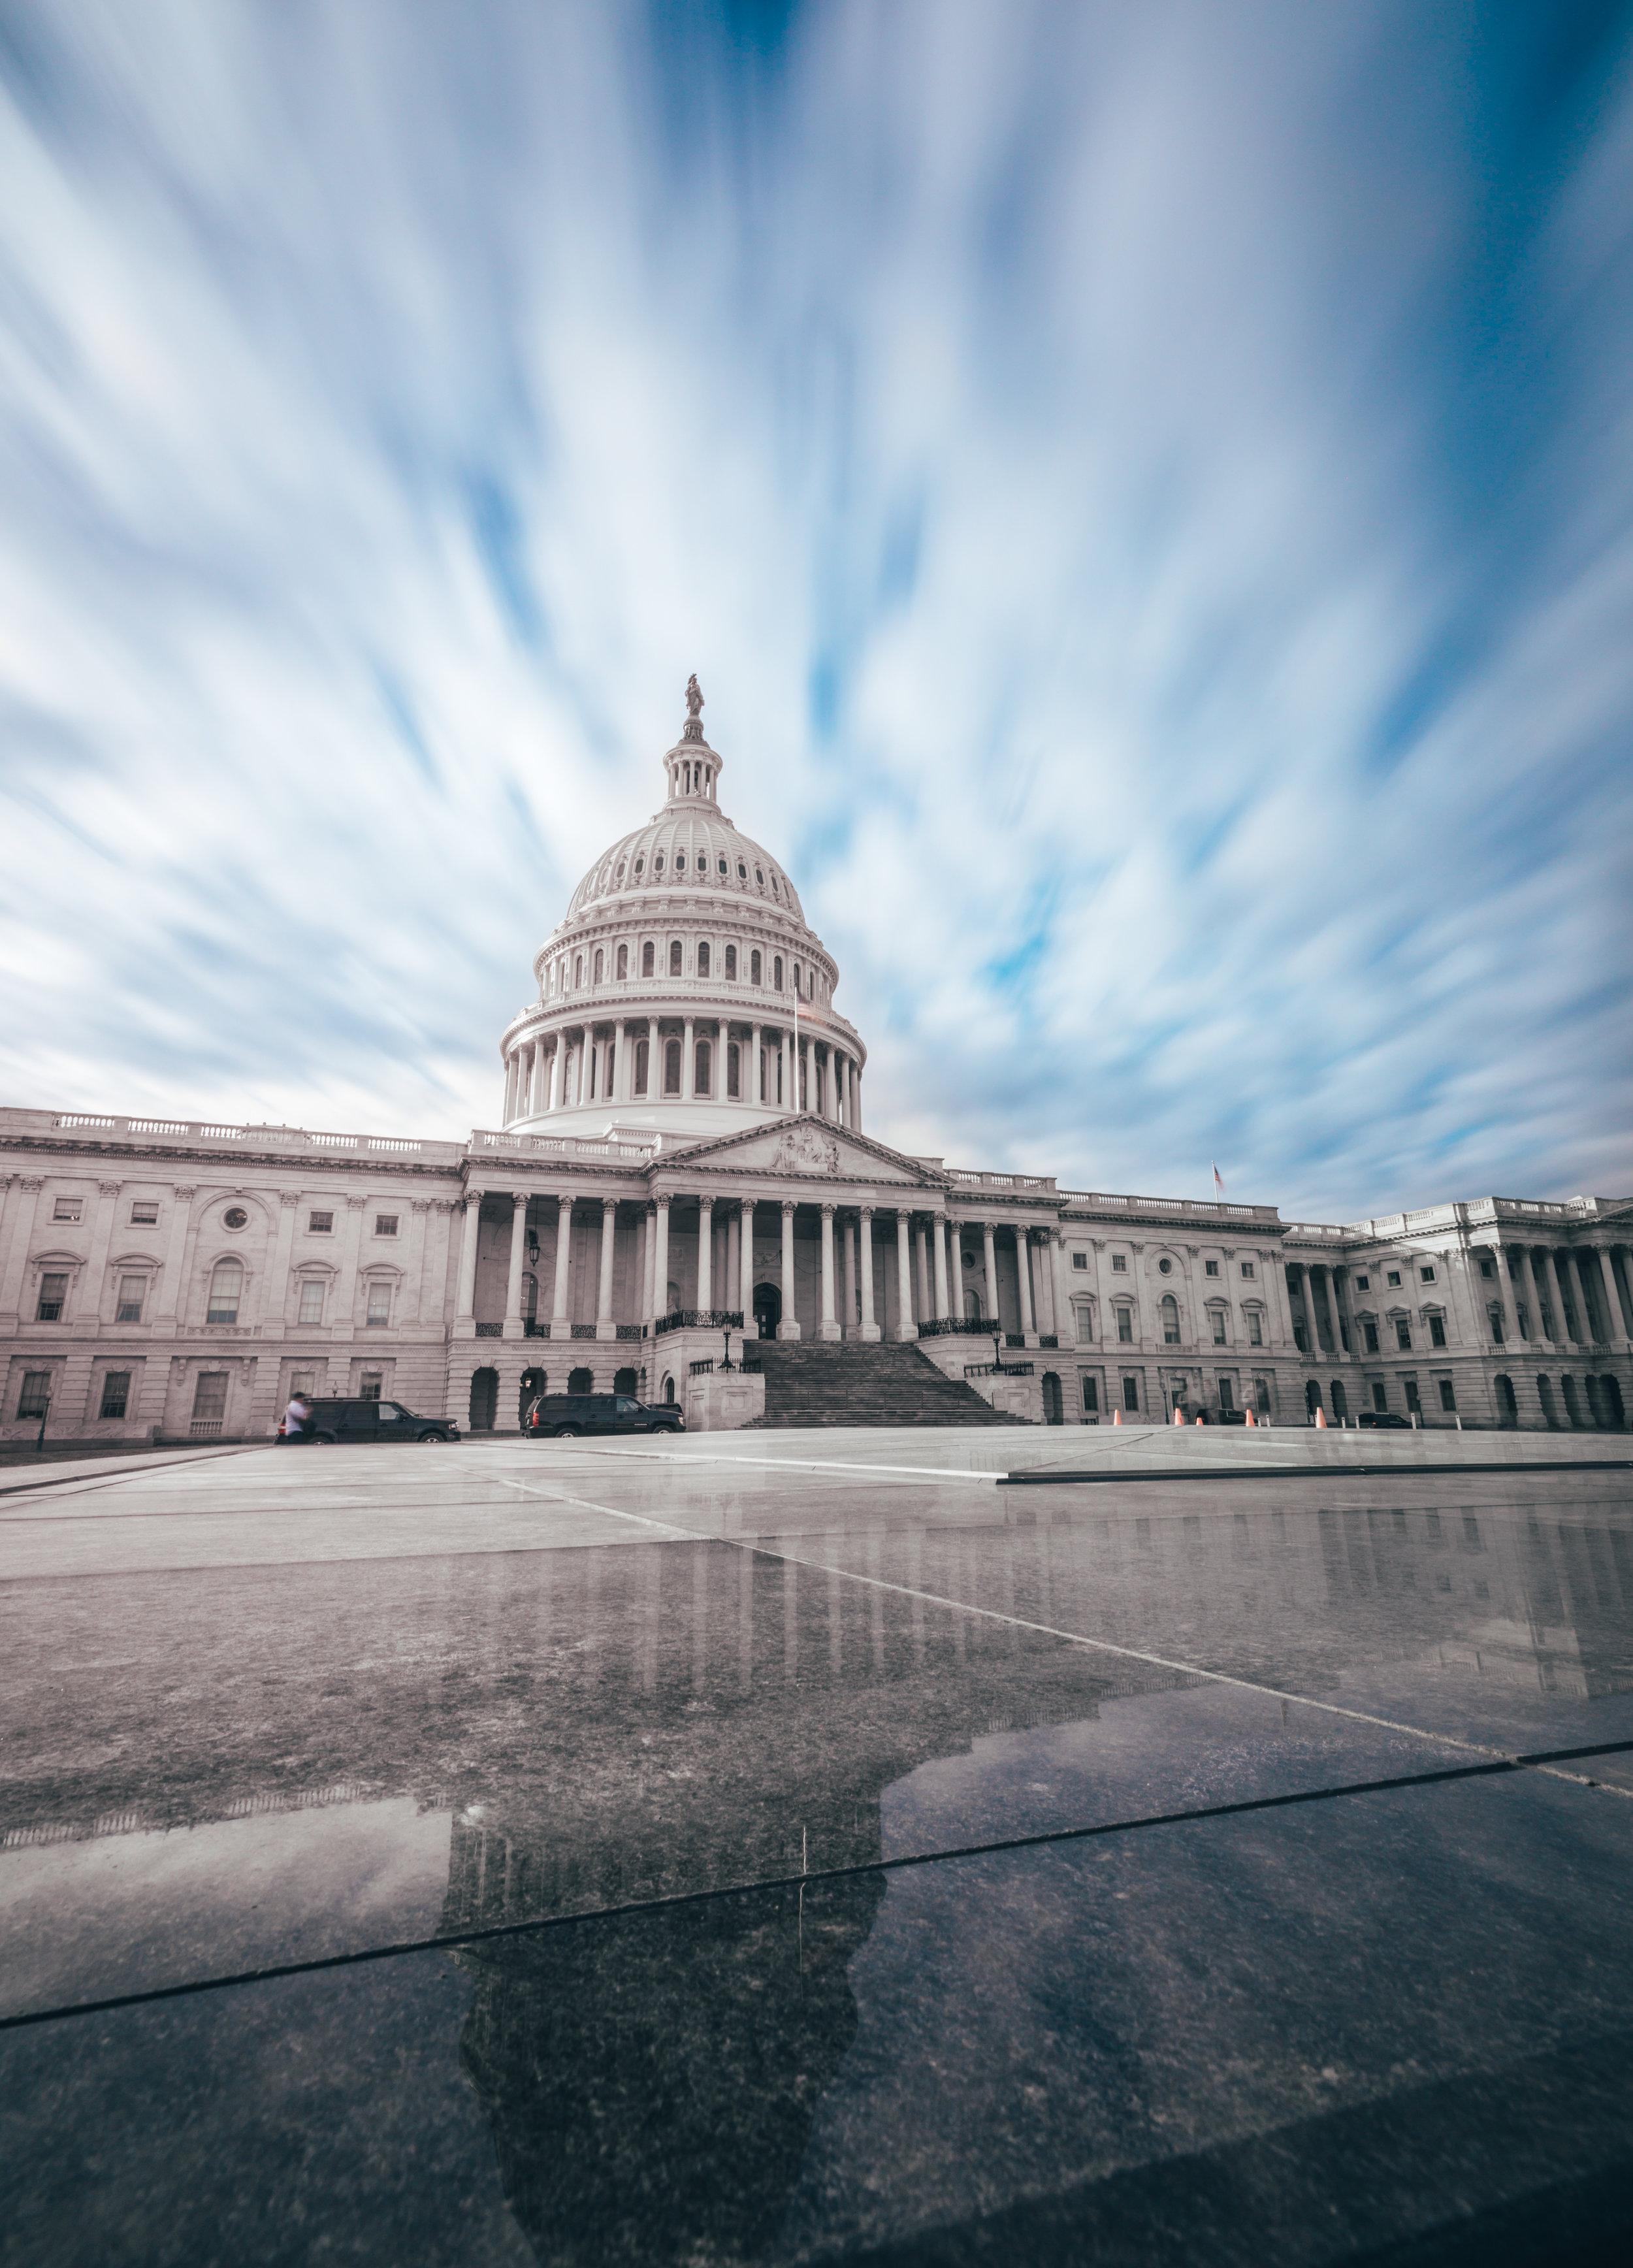 THE 2019 STRATEGIC 50 U.S. PROJECTS REPORT